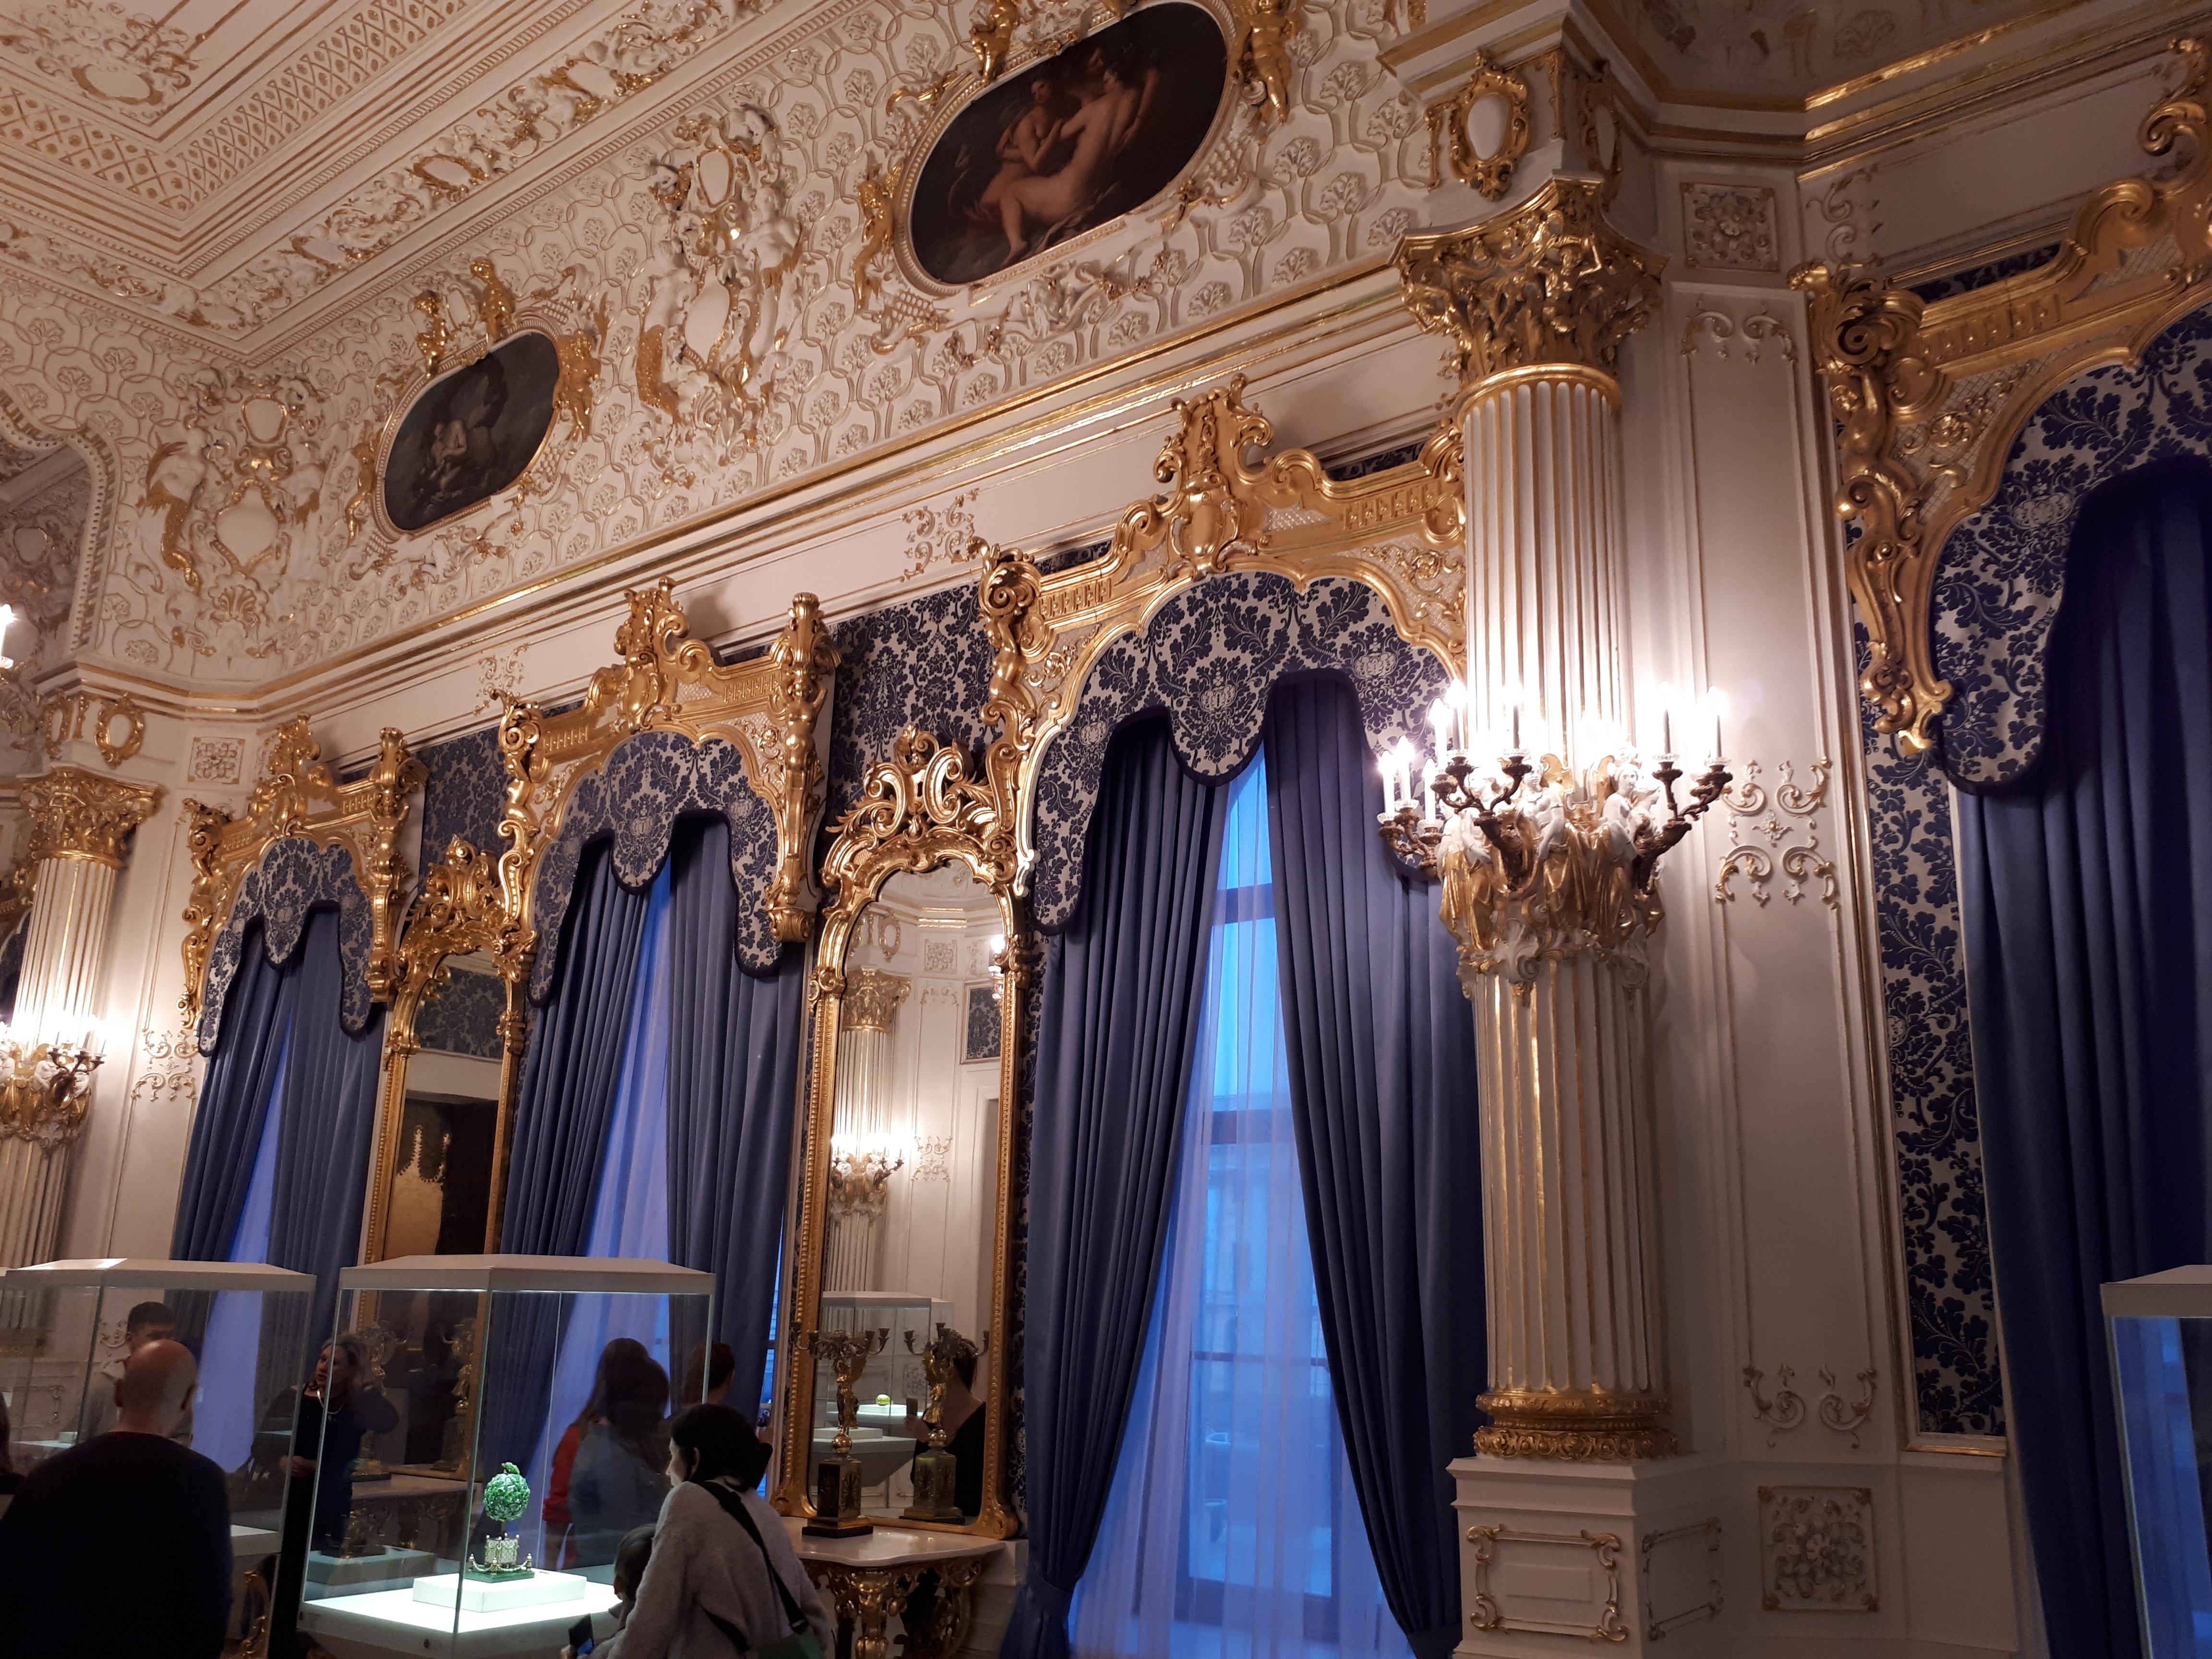 Shuvalov Palace. Interiors